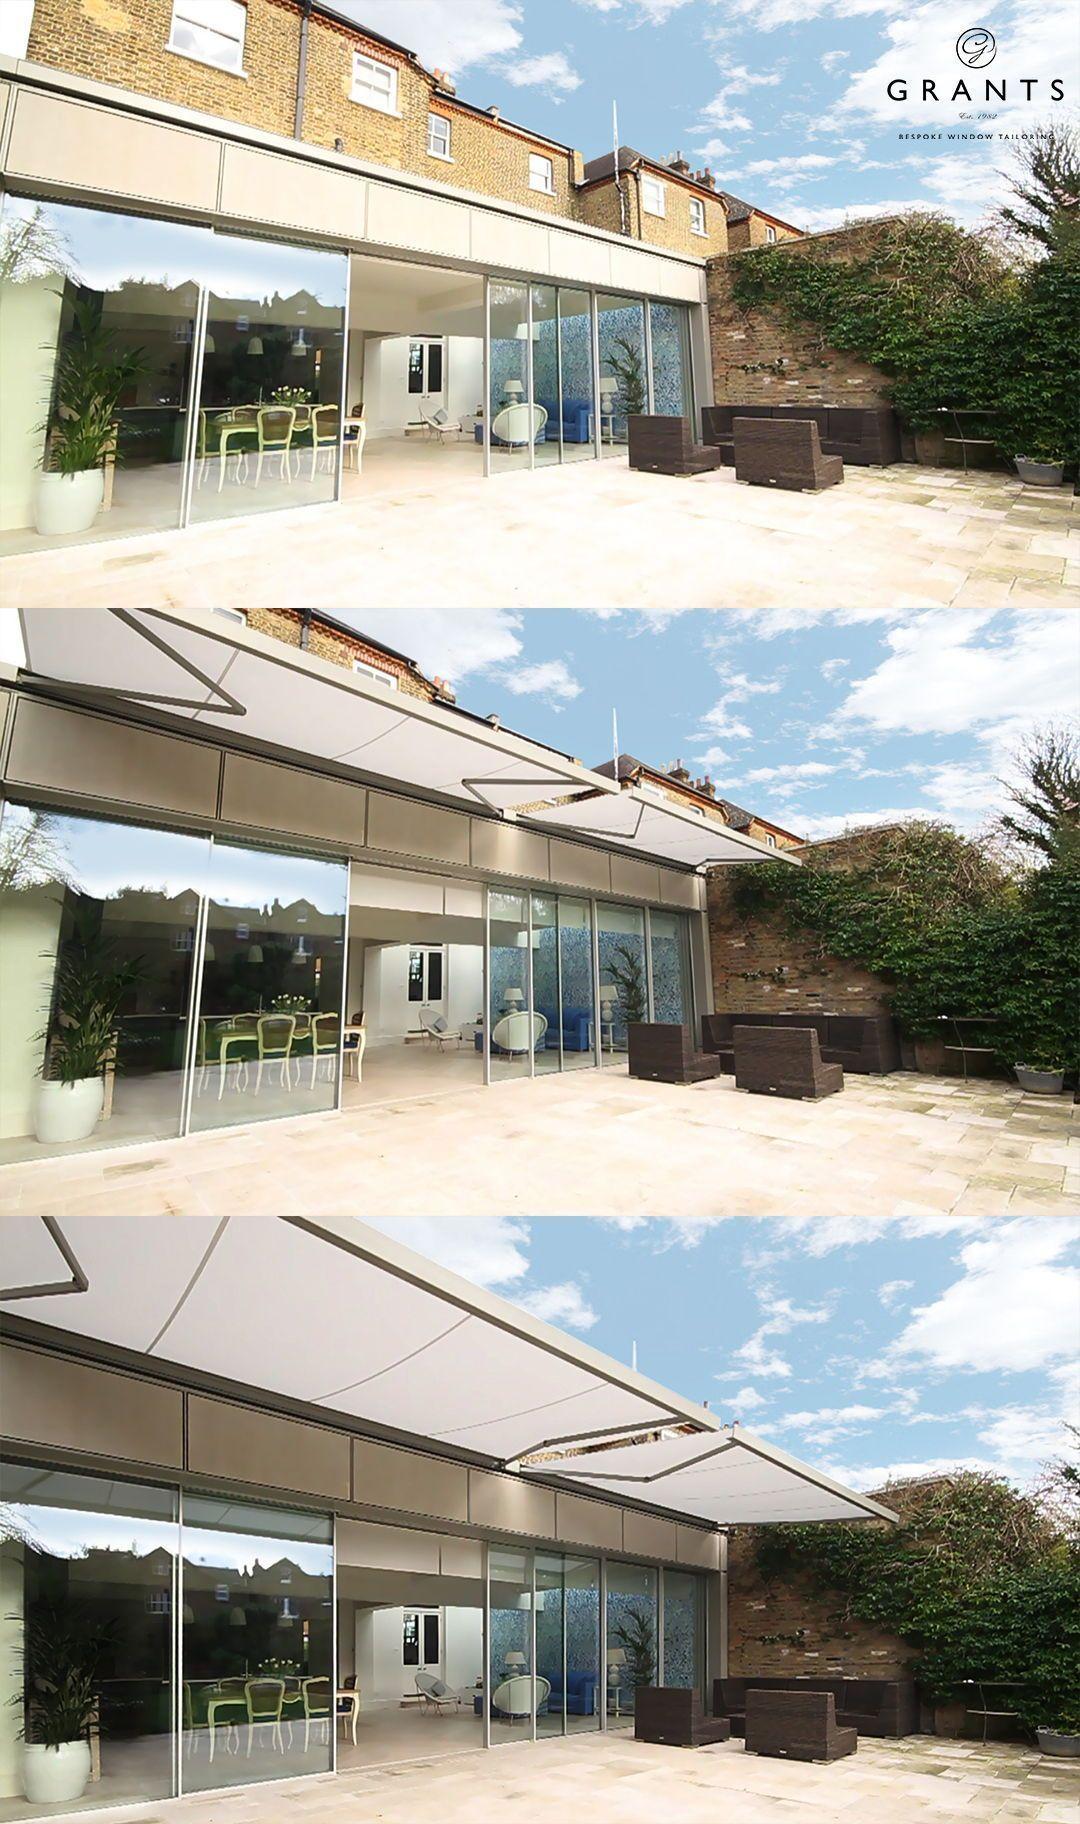 Usb Flash Drive Metal Patio Awning Metal Patio Awning Wood Patio Awning Outdoor Patio Awnings Retractable Canopy Pa In 2020 Outdoor Shade Patio Backyard Shade